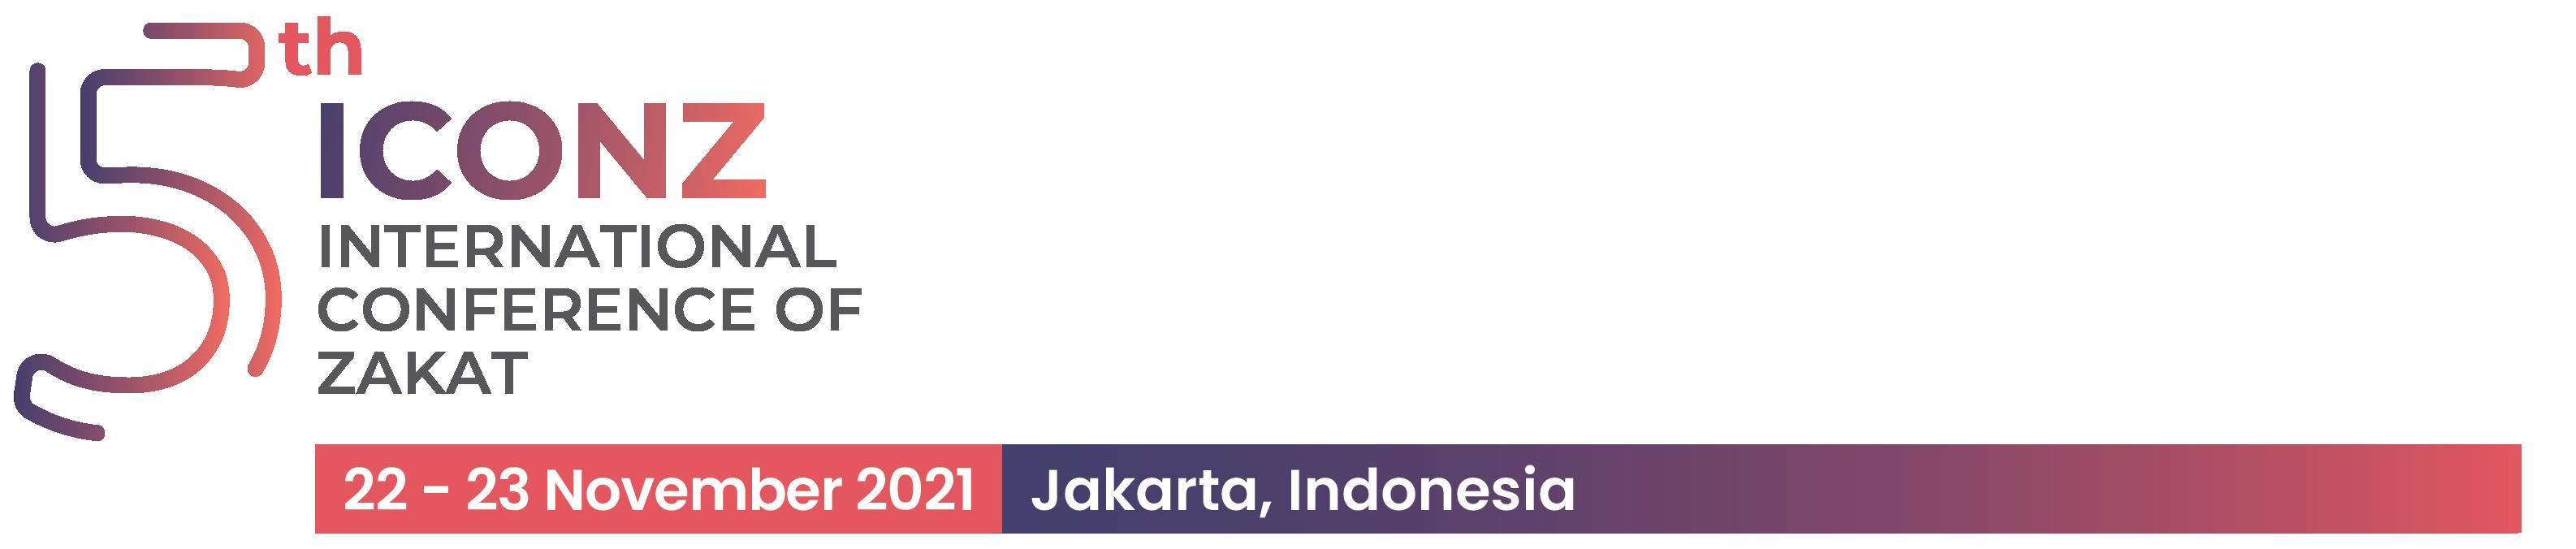 International Conference of Zakat (ICONZ)